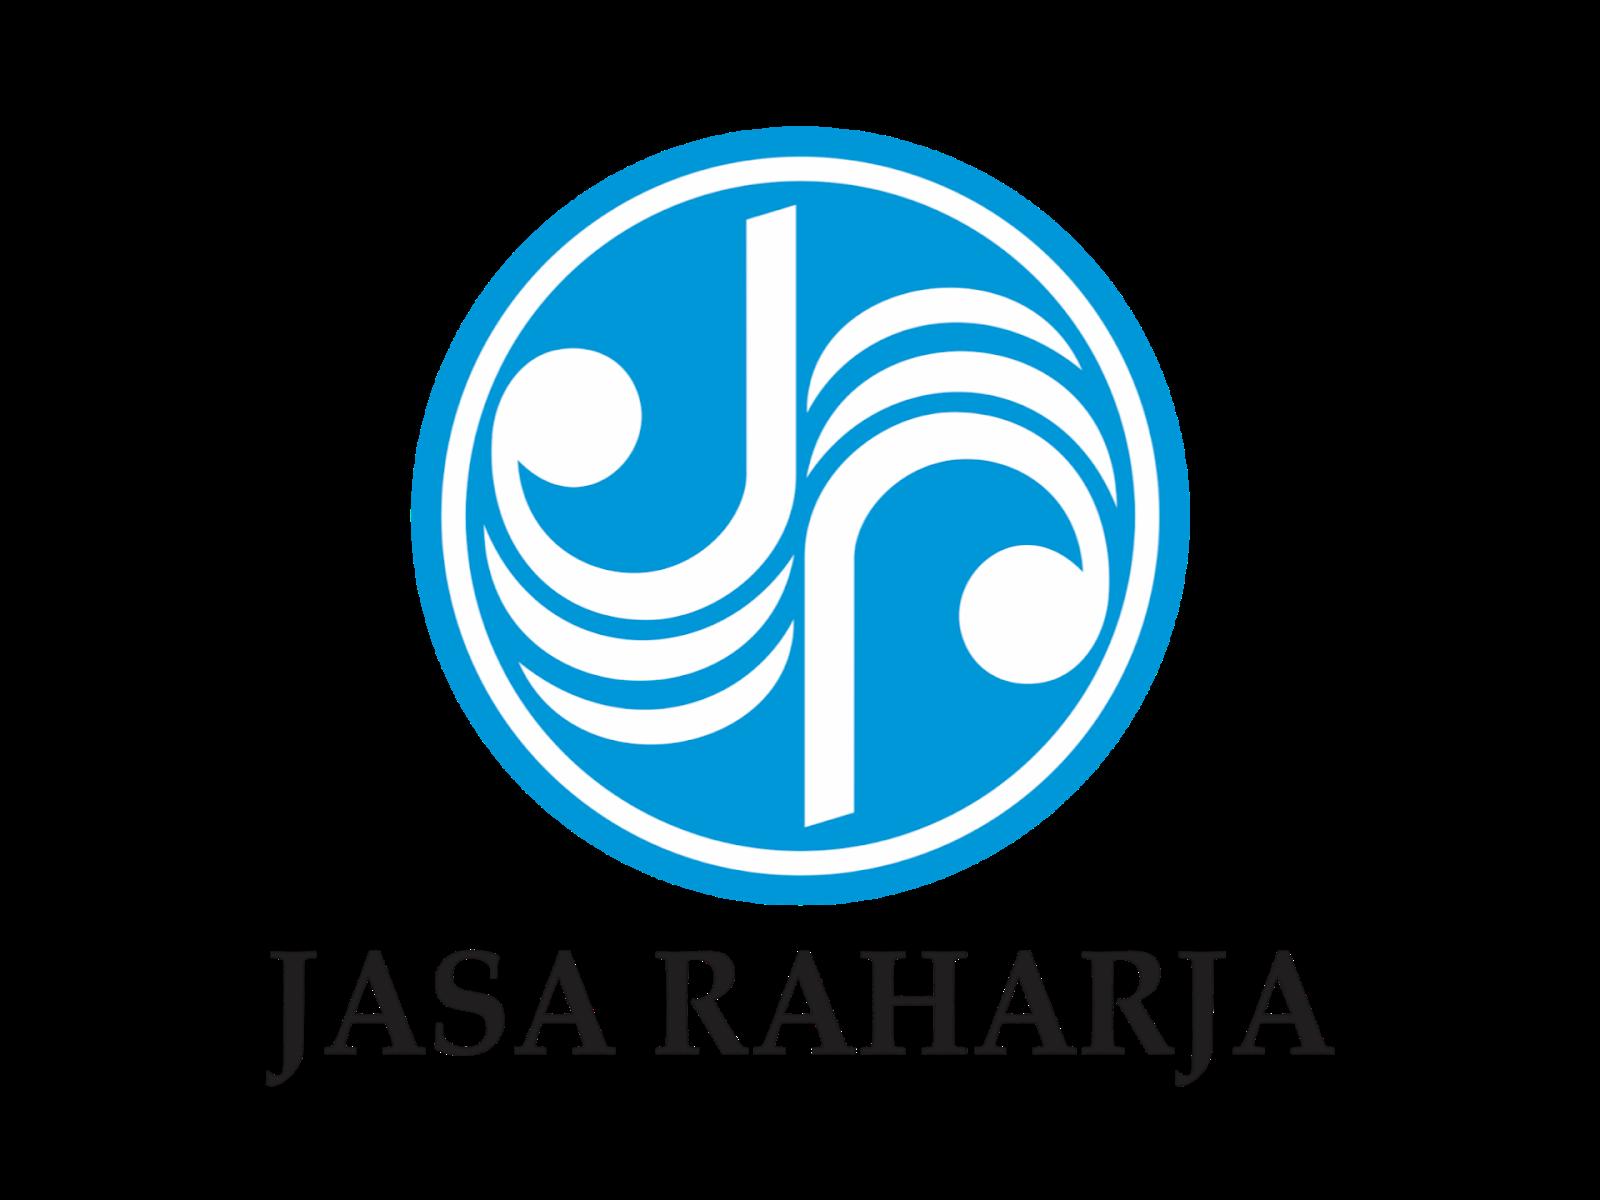 Logo Jasa Raharja Format PNG